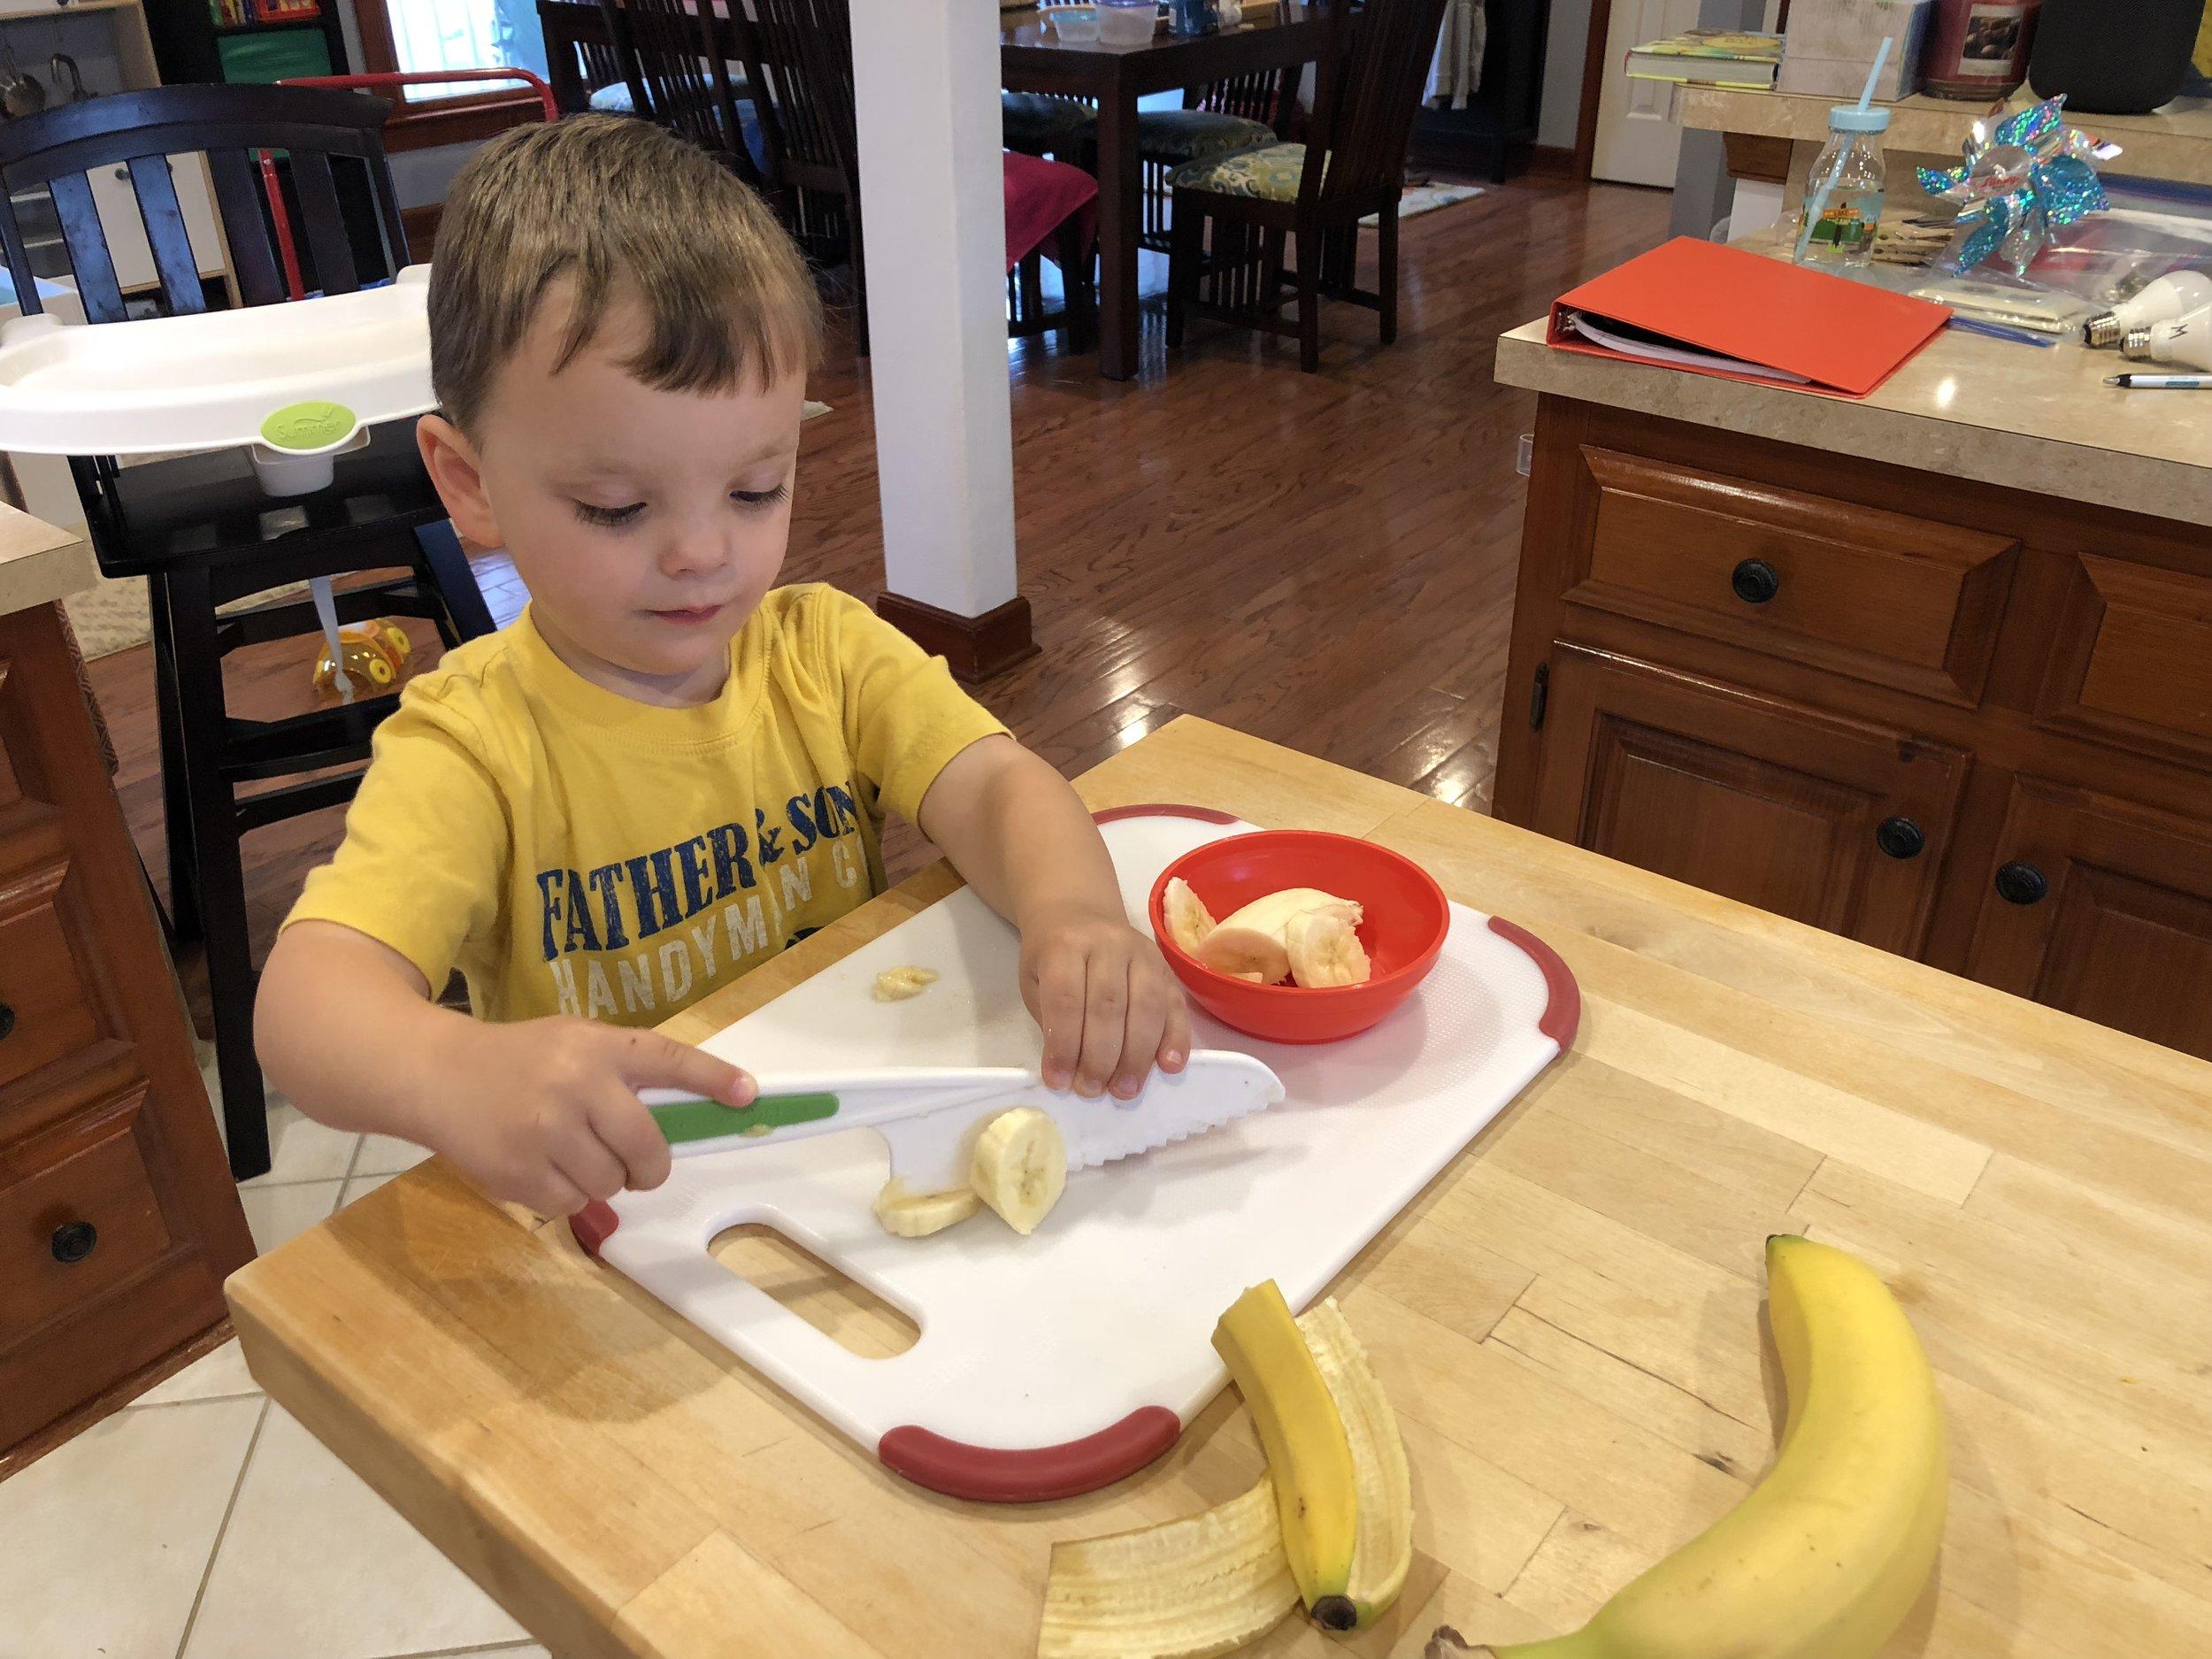 7 Parker cutting food.jpg